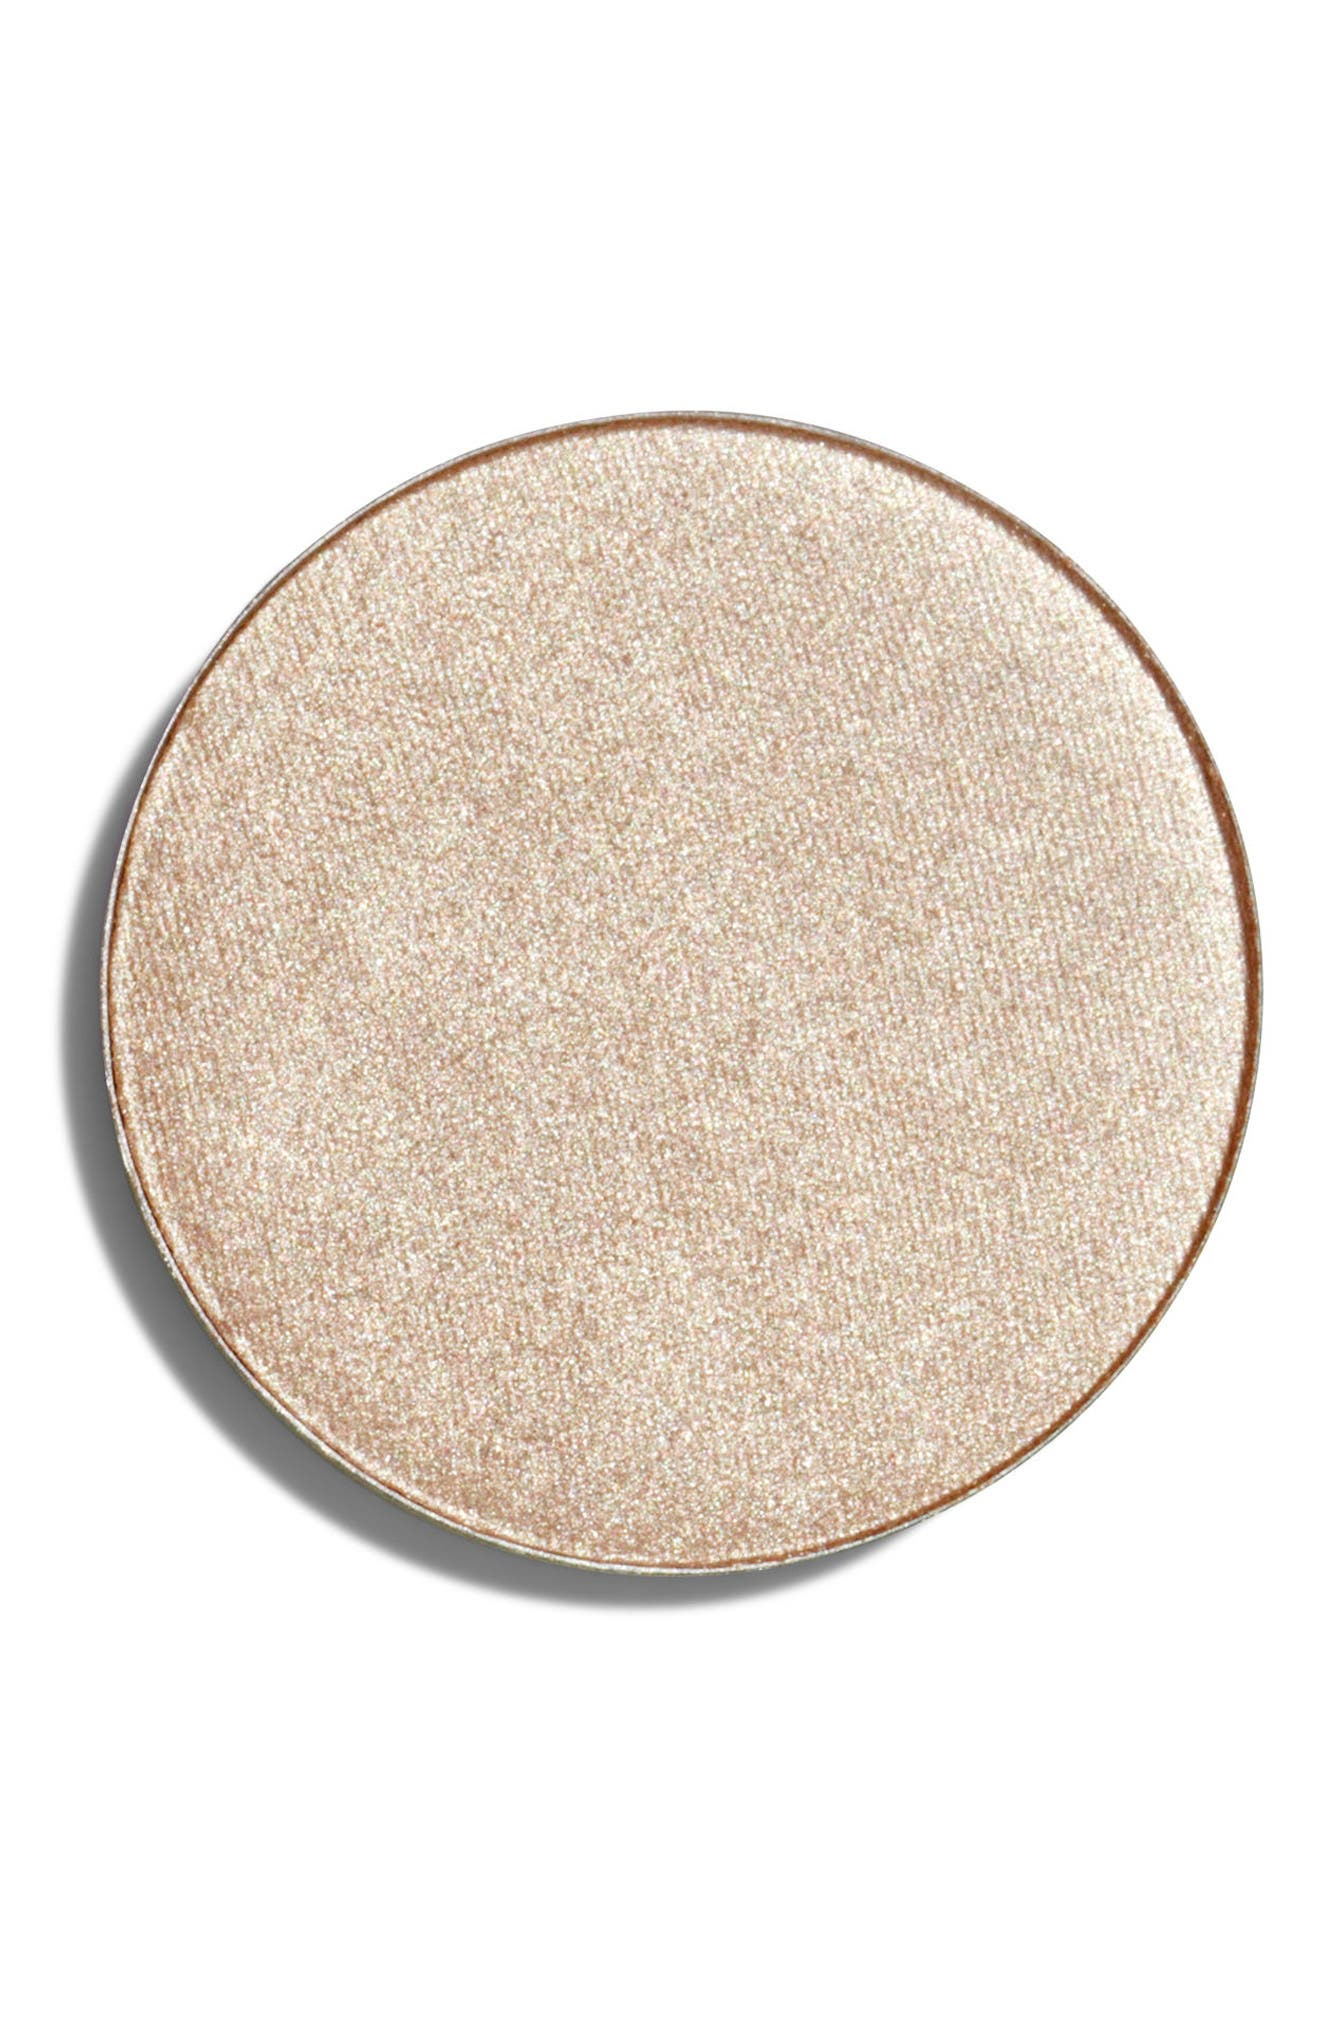 Main Image - Chantecaille Shine Eye Shade Refill